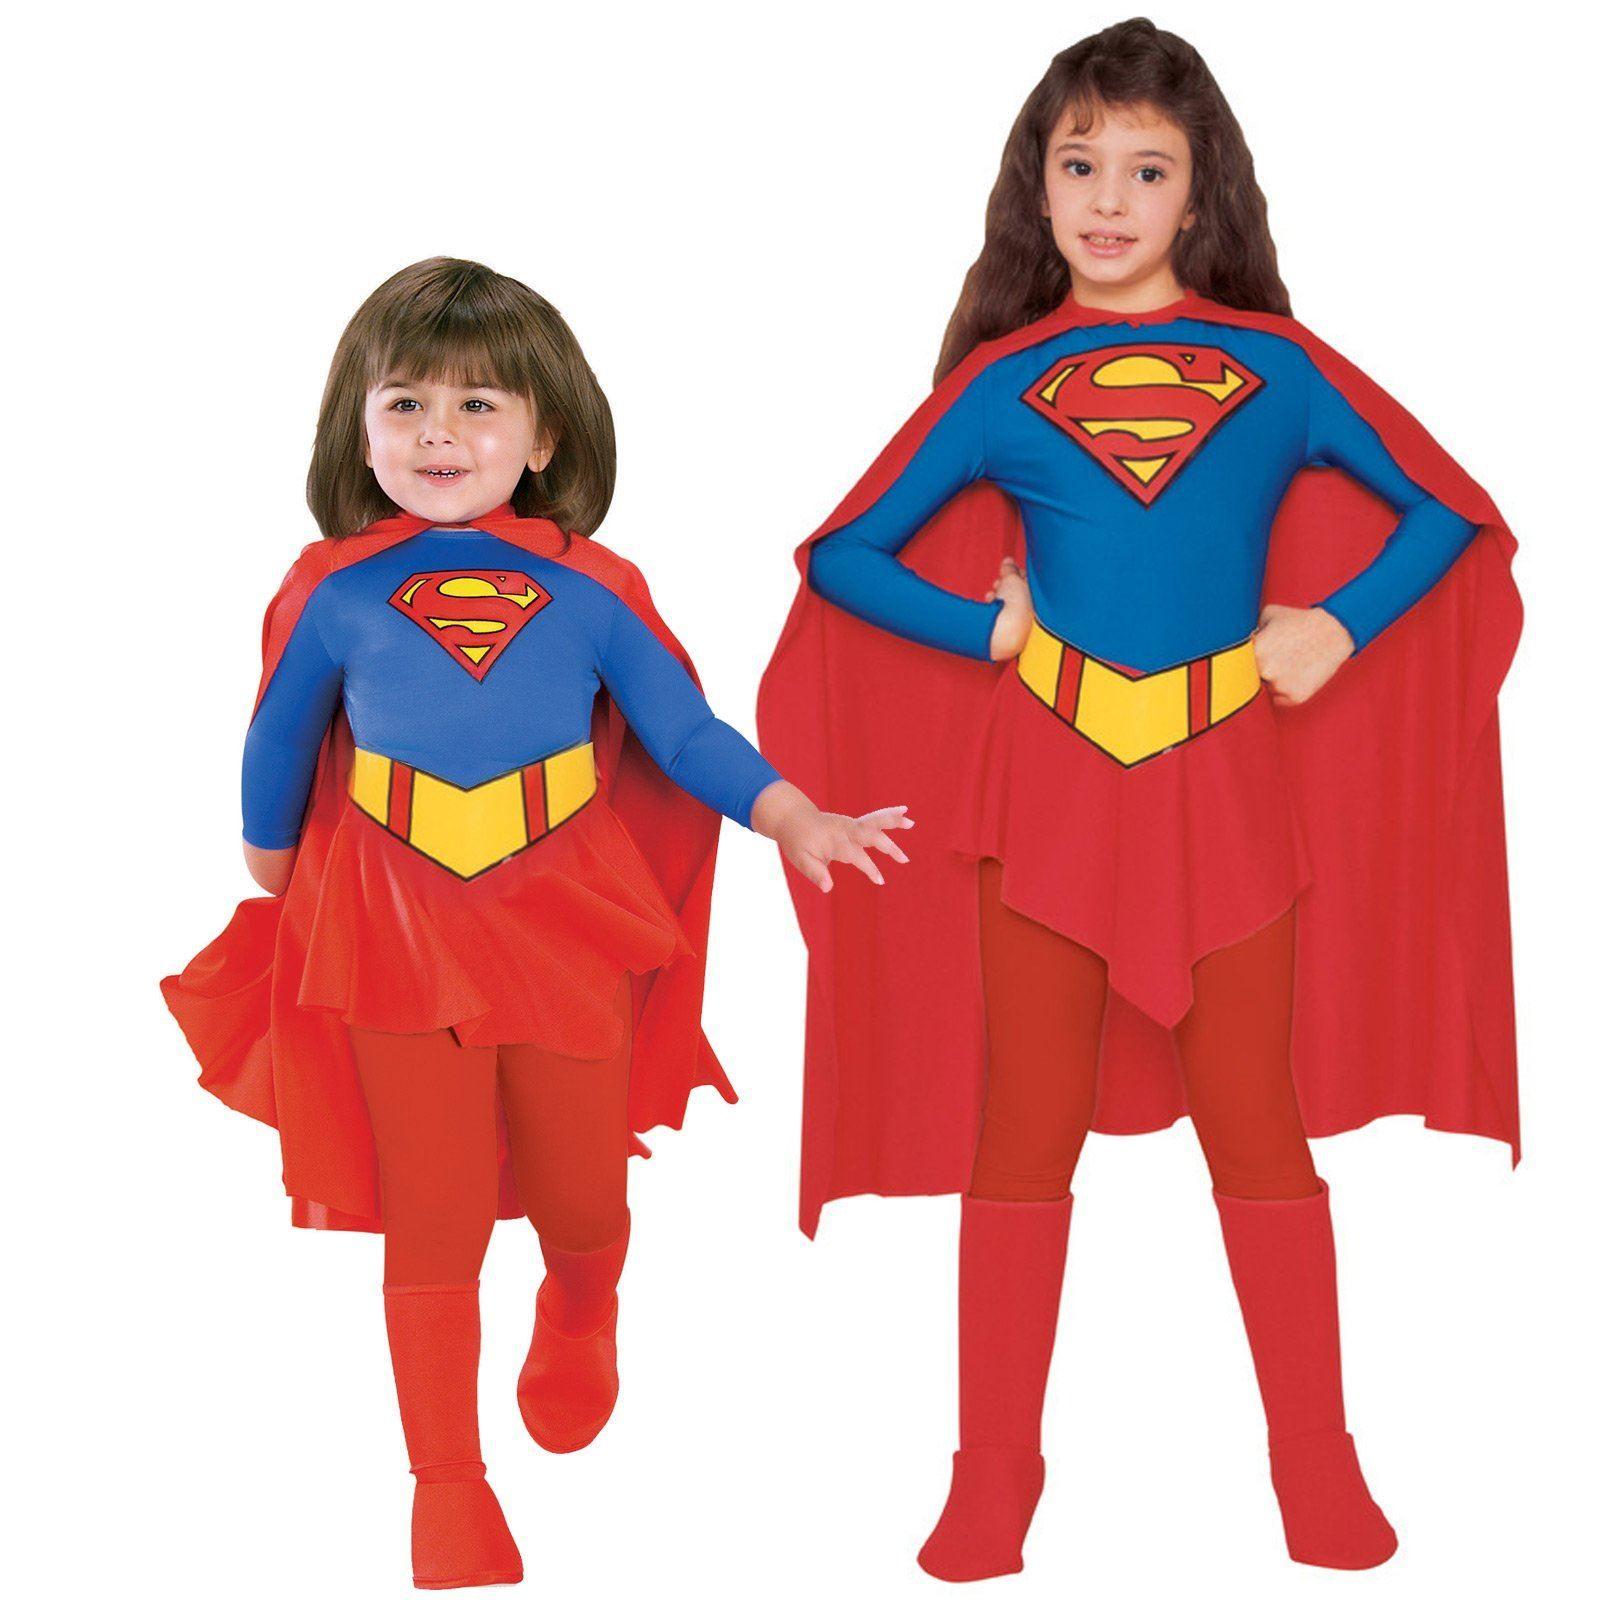 Kids Supergirl DC Comics Girls Costume | Supergirl costume ...Superwoman Costume For Teenagers